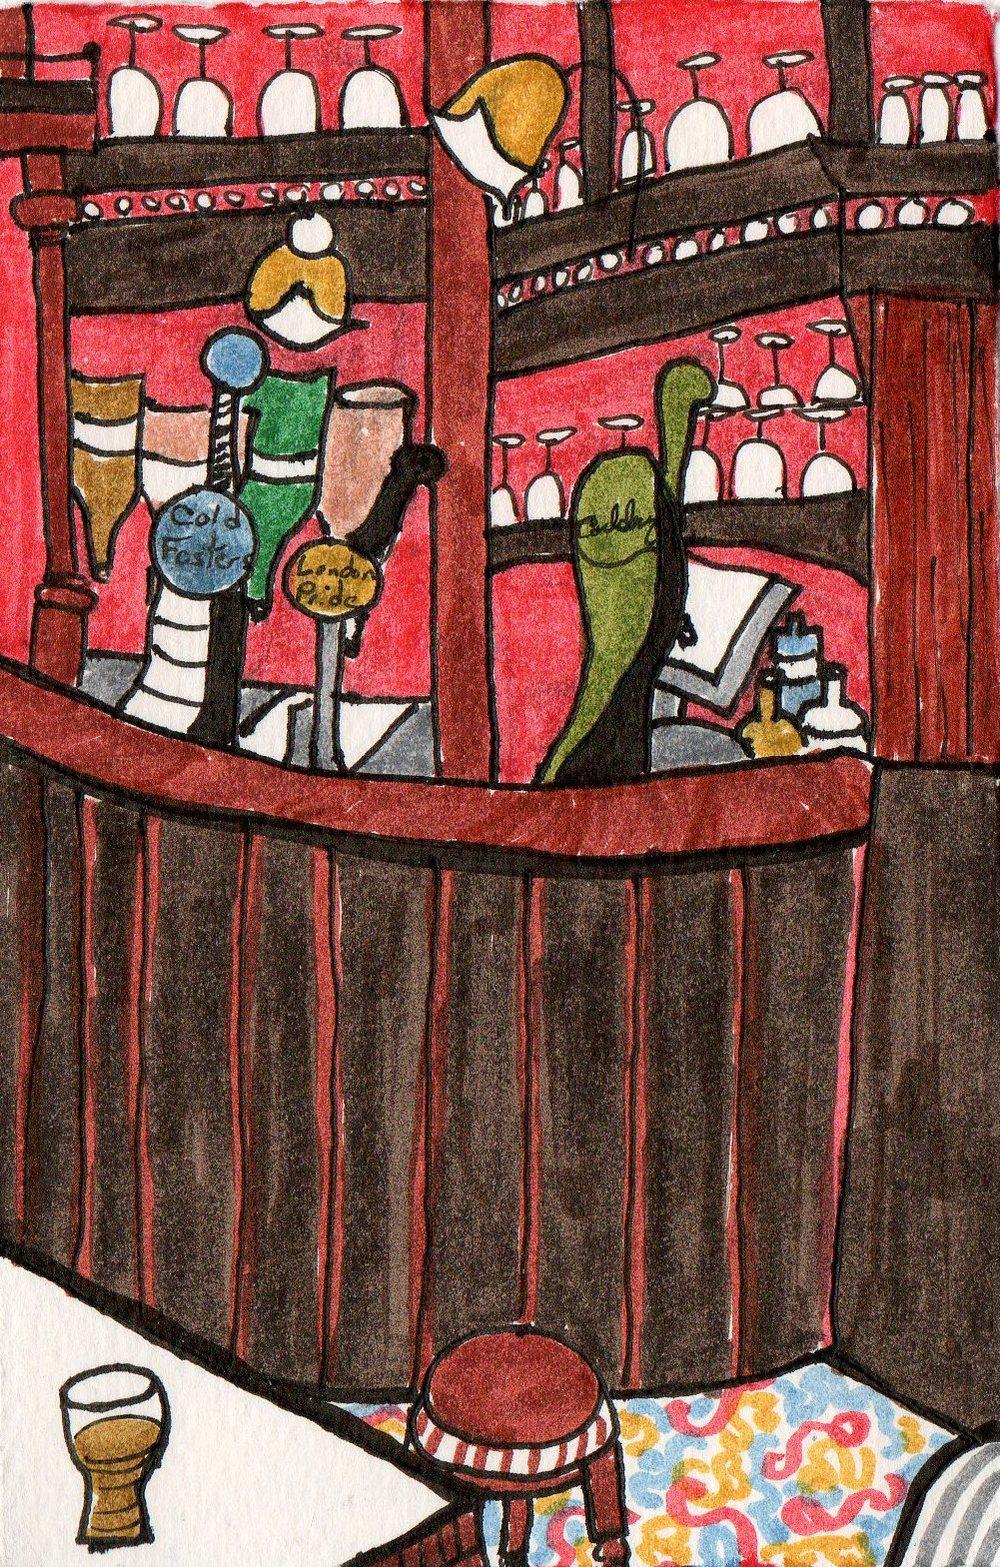 the crown pub london